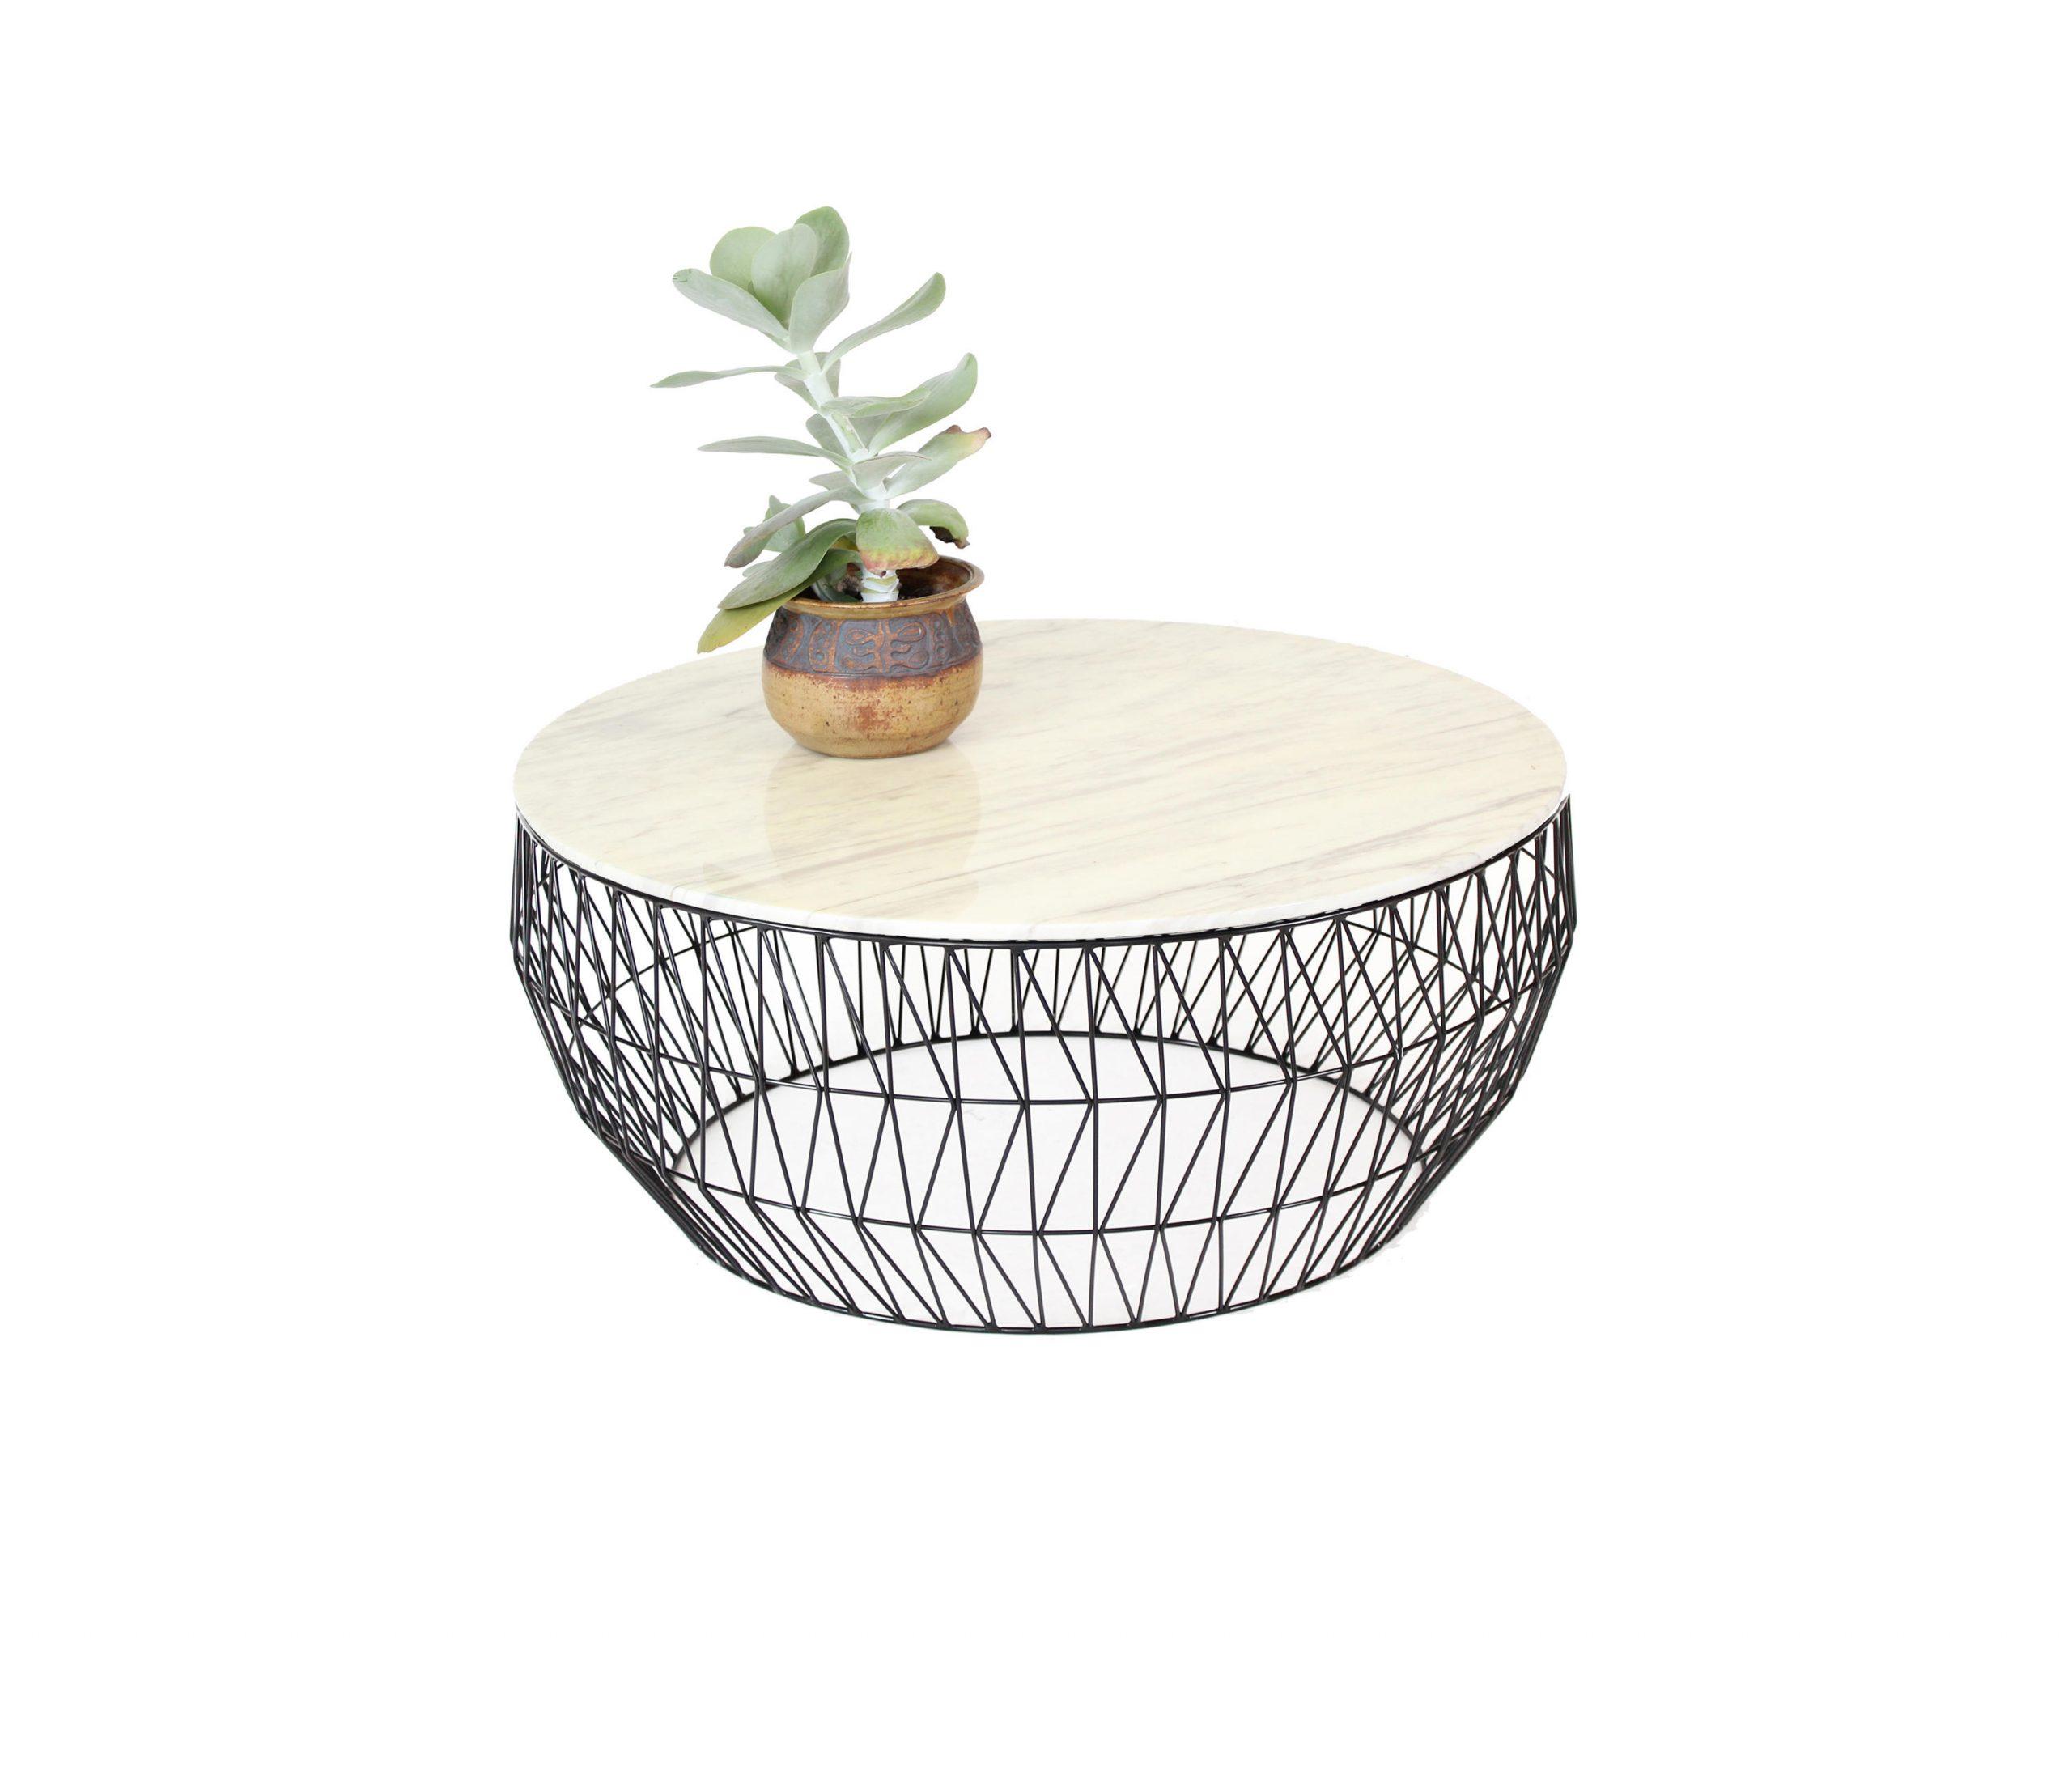 Coffee Table Base - Tables Basses De Bend Goods   Architonic intérieur Carrelage Id 76753 Cappucino